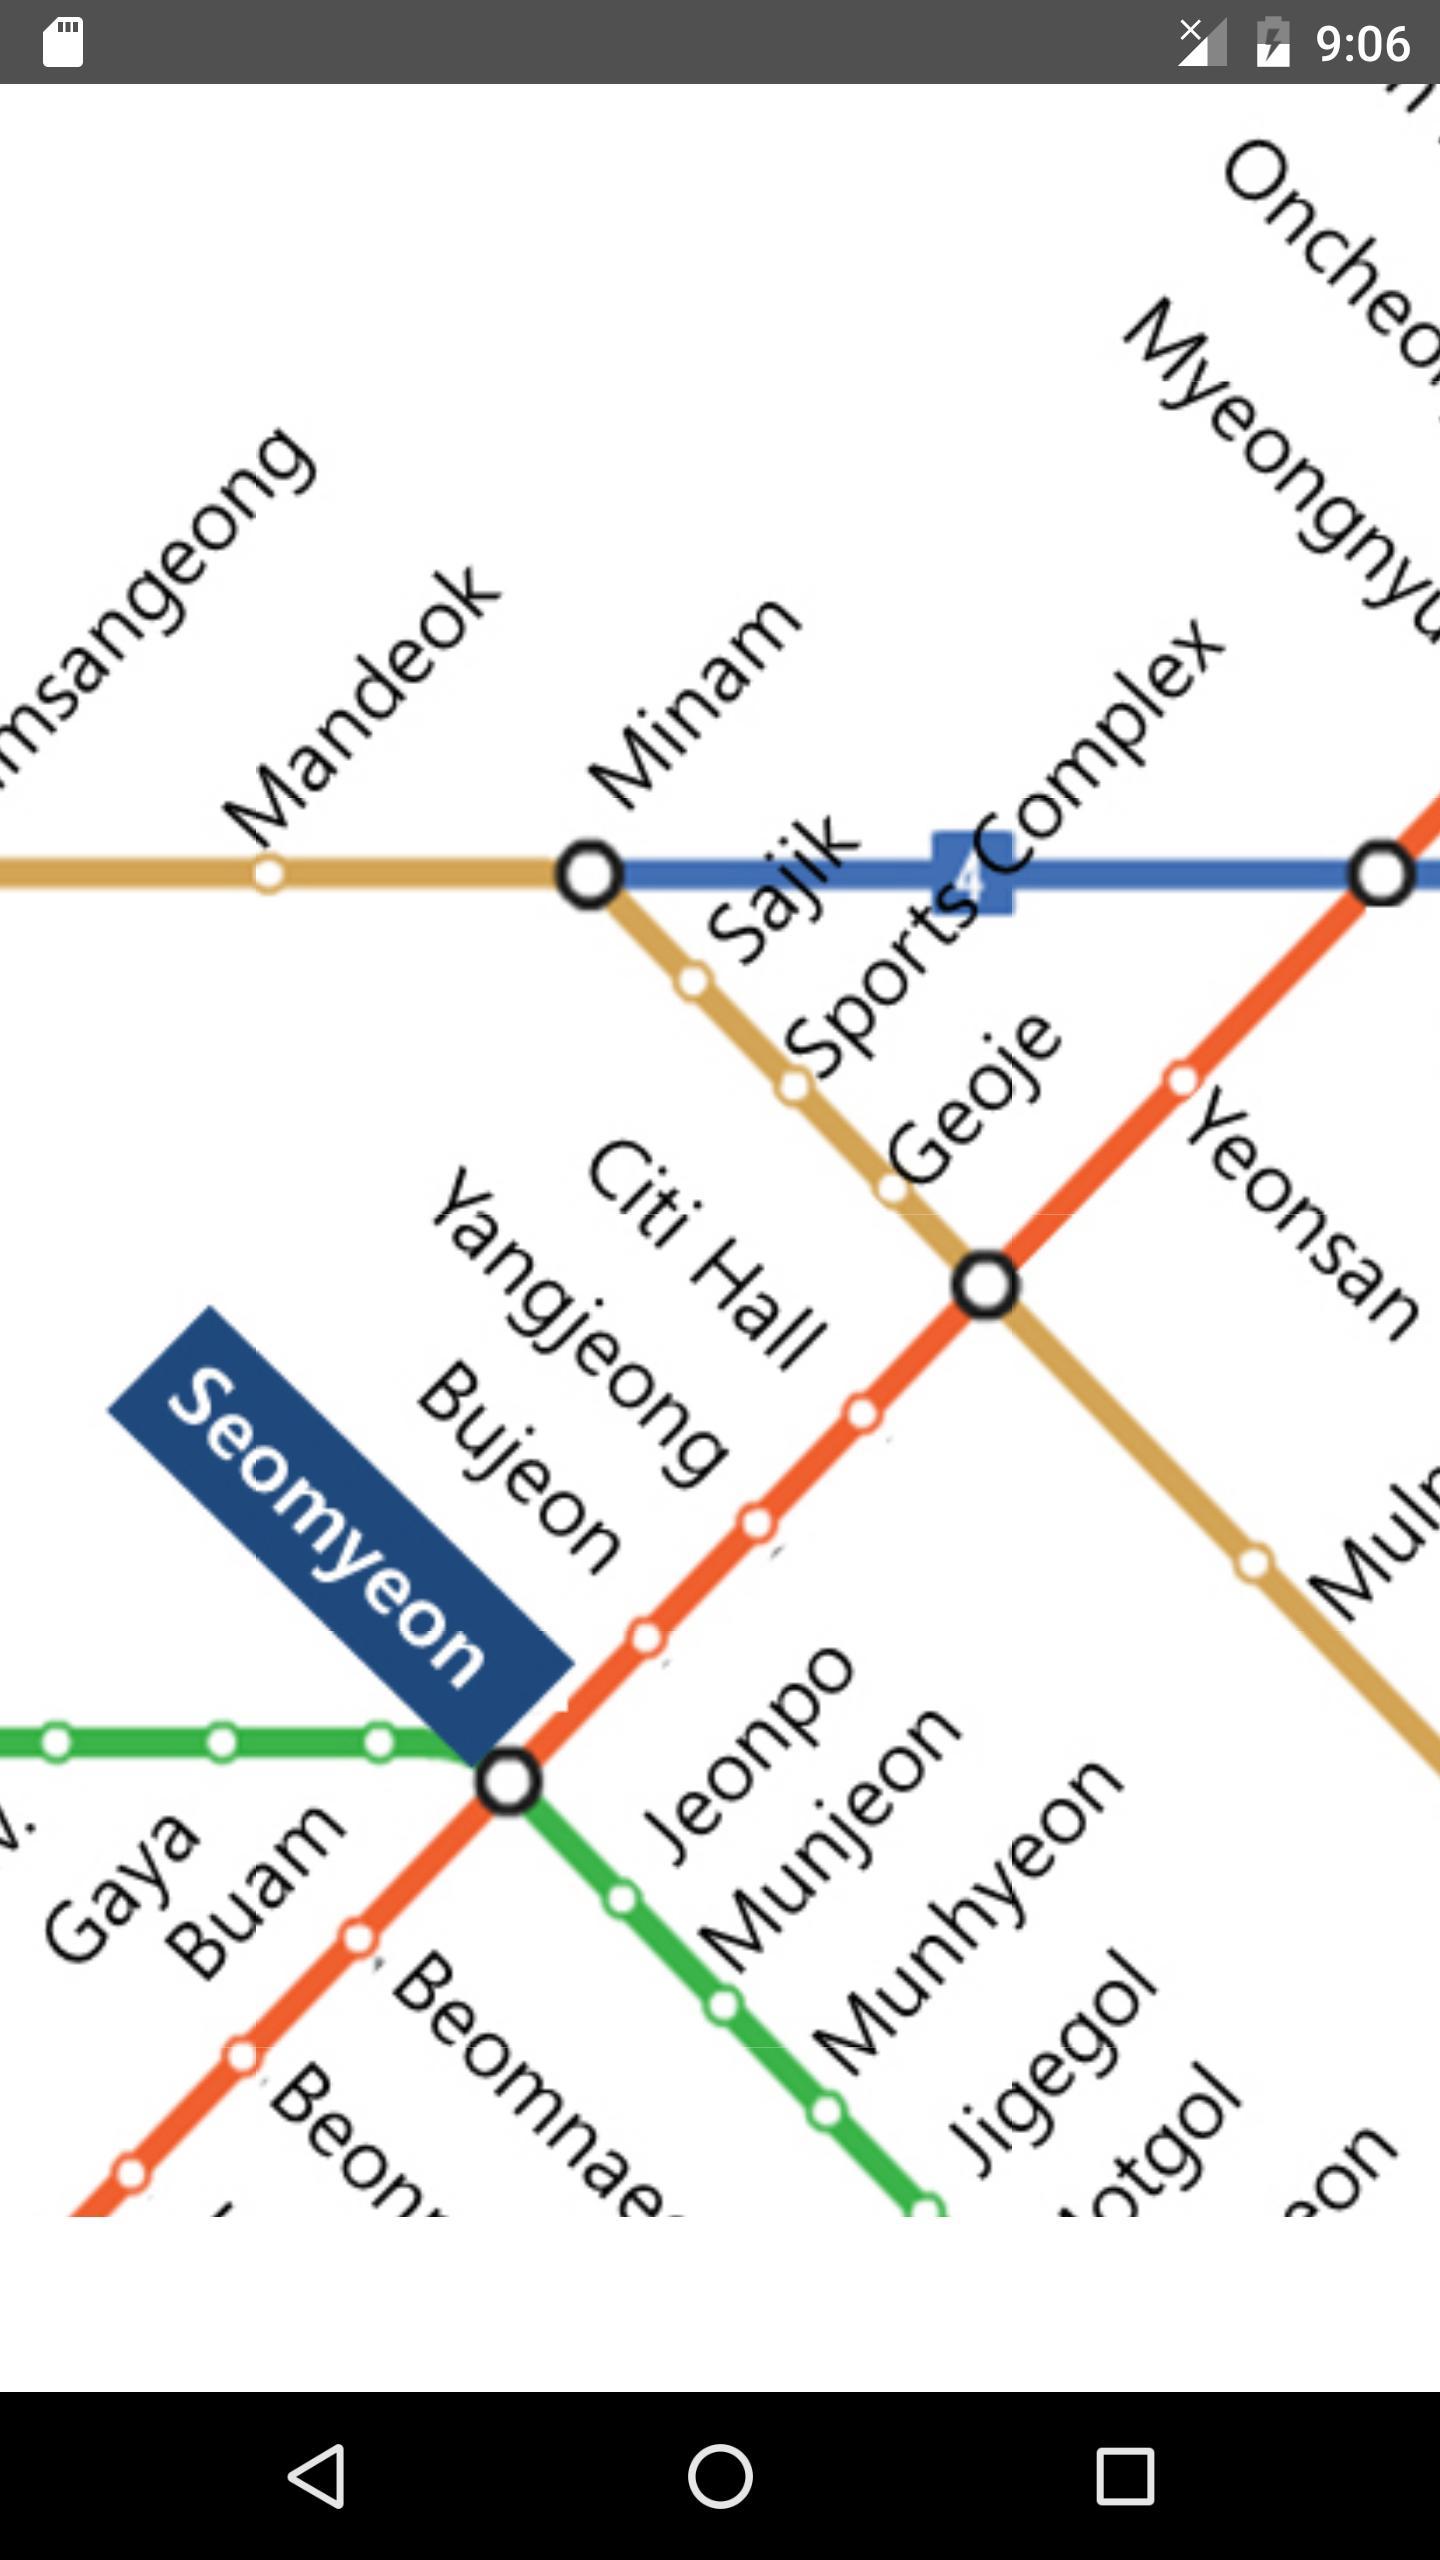 Busan Subway Map 2017.Busan Metro Map 2017 For Android Apk Download